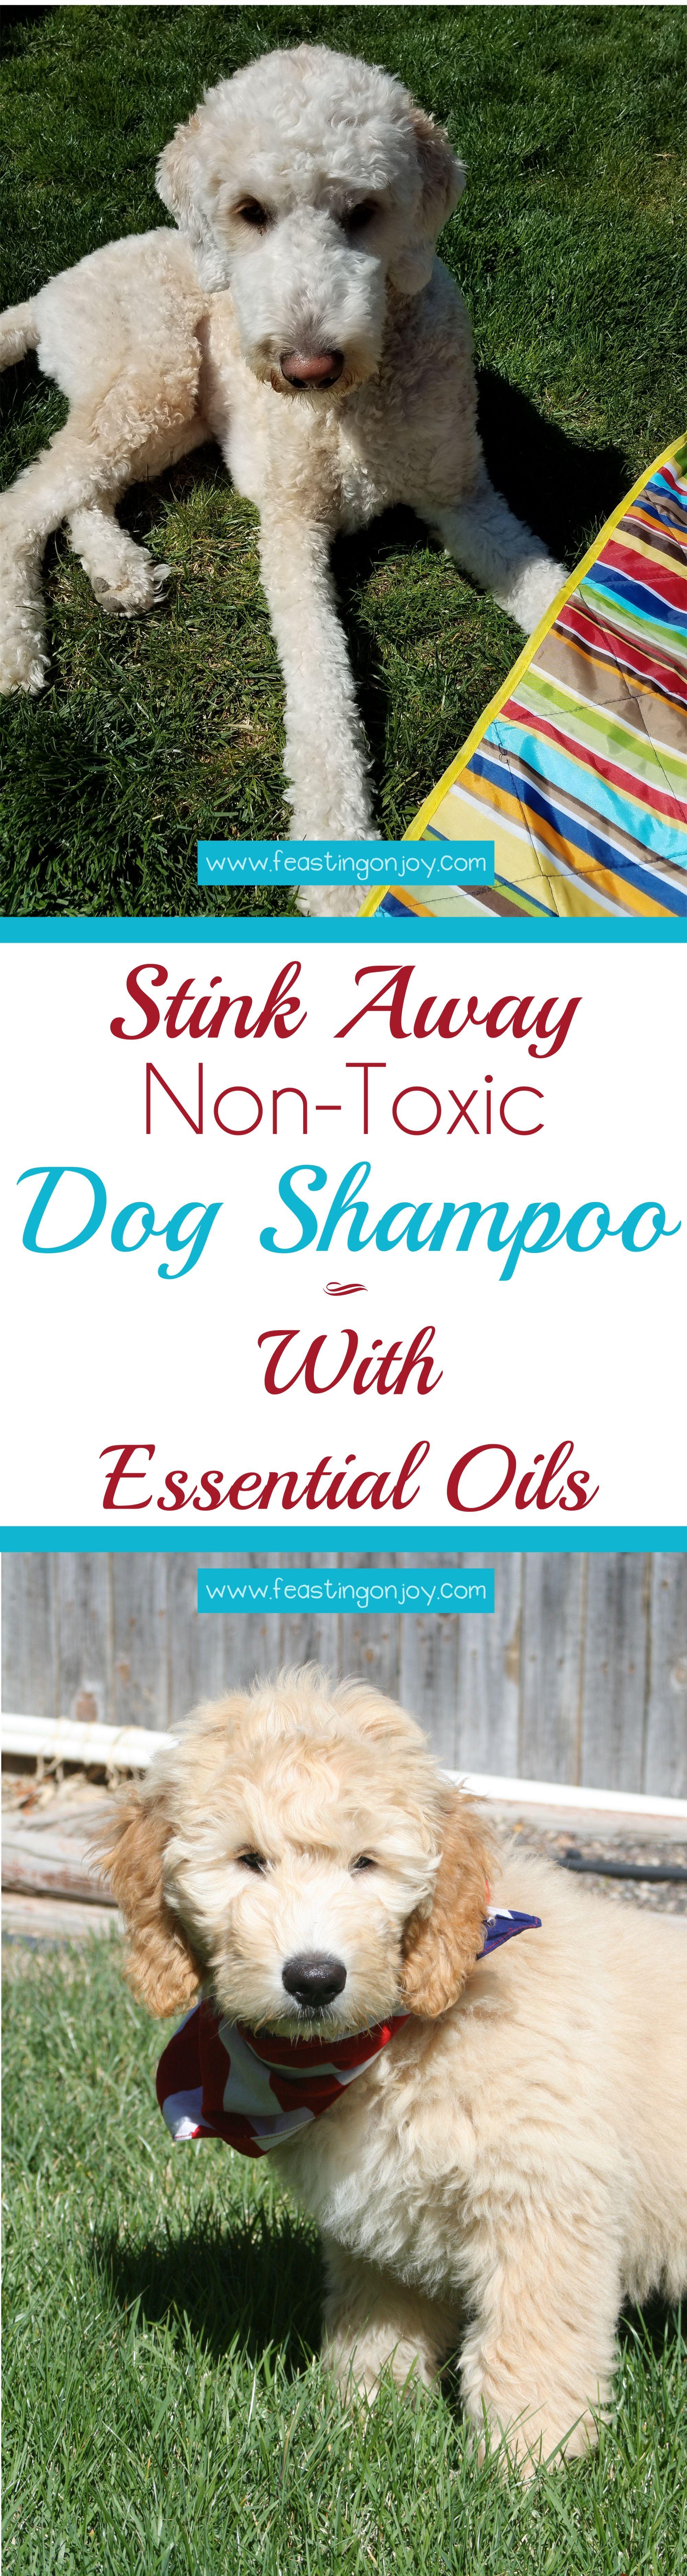 Stink Away DIY NonToxic Dog Shampoo With Essential Oils